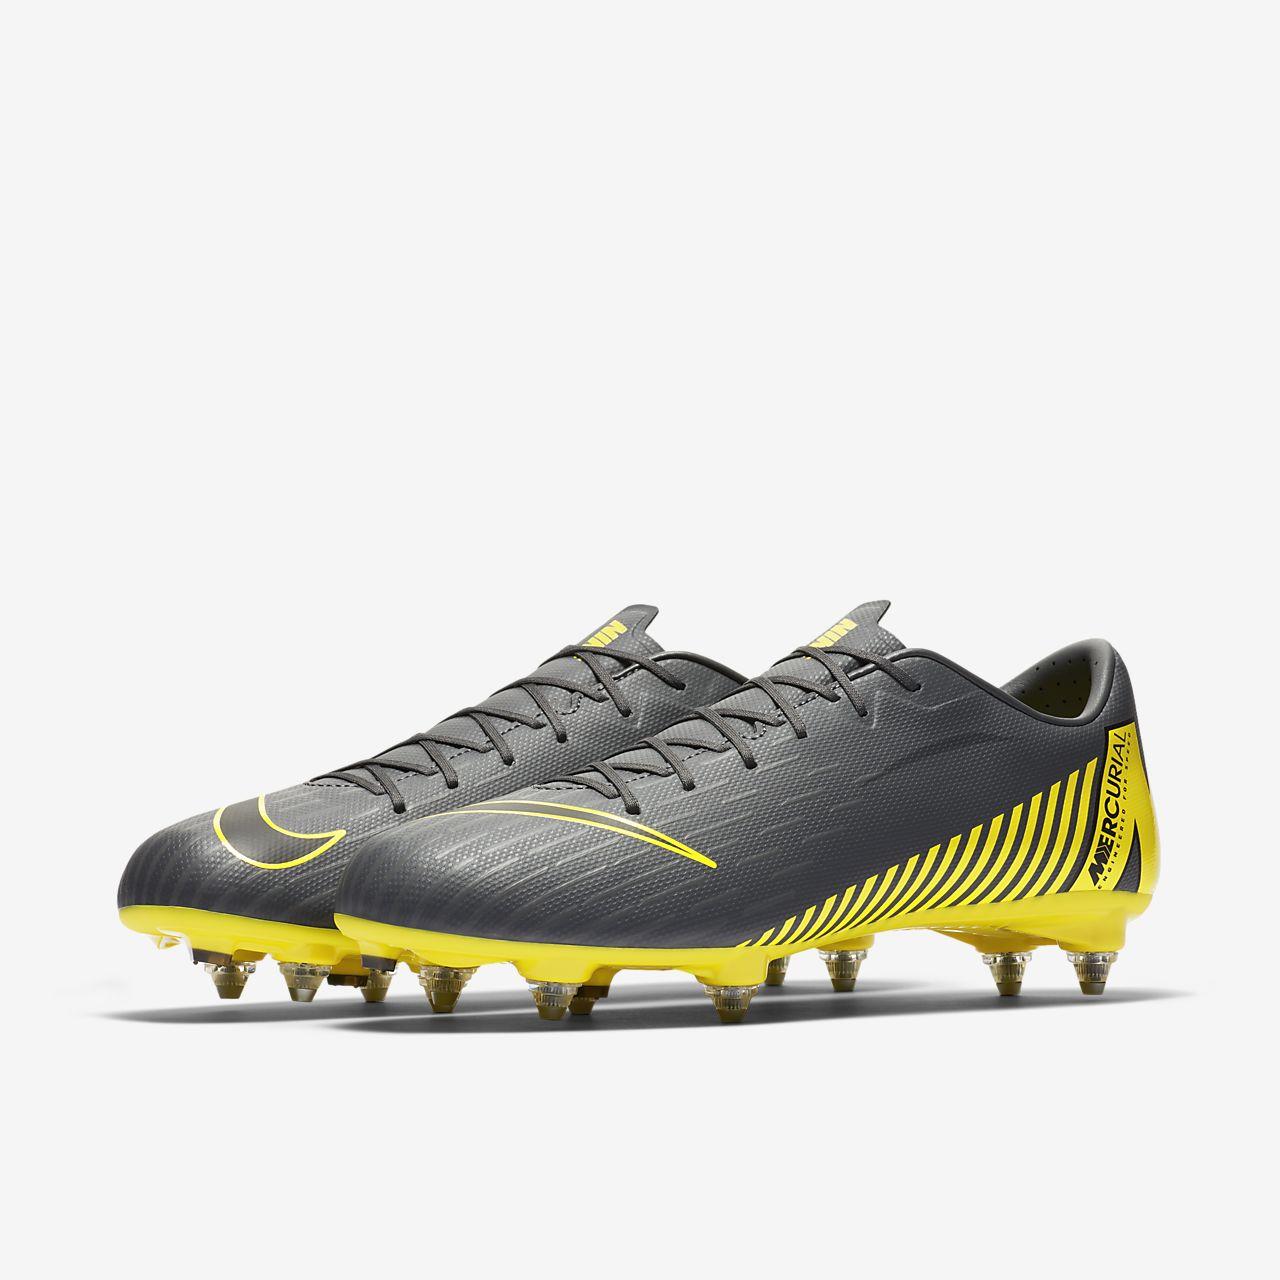 c4315ed40246 Nike Mercurial Vapor XII Academy SG-PRO Soft-Ground Football Boot ...